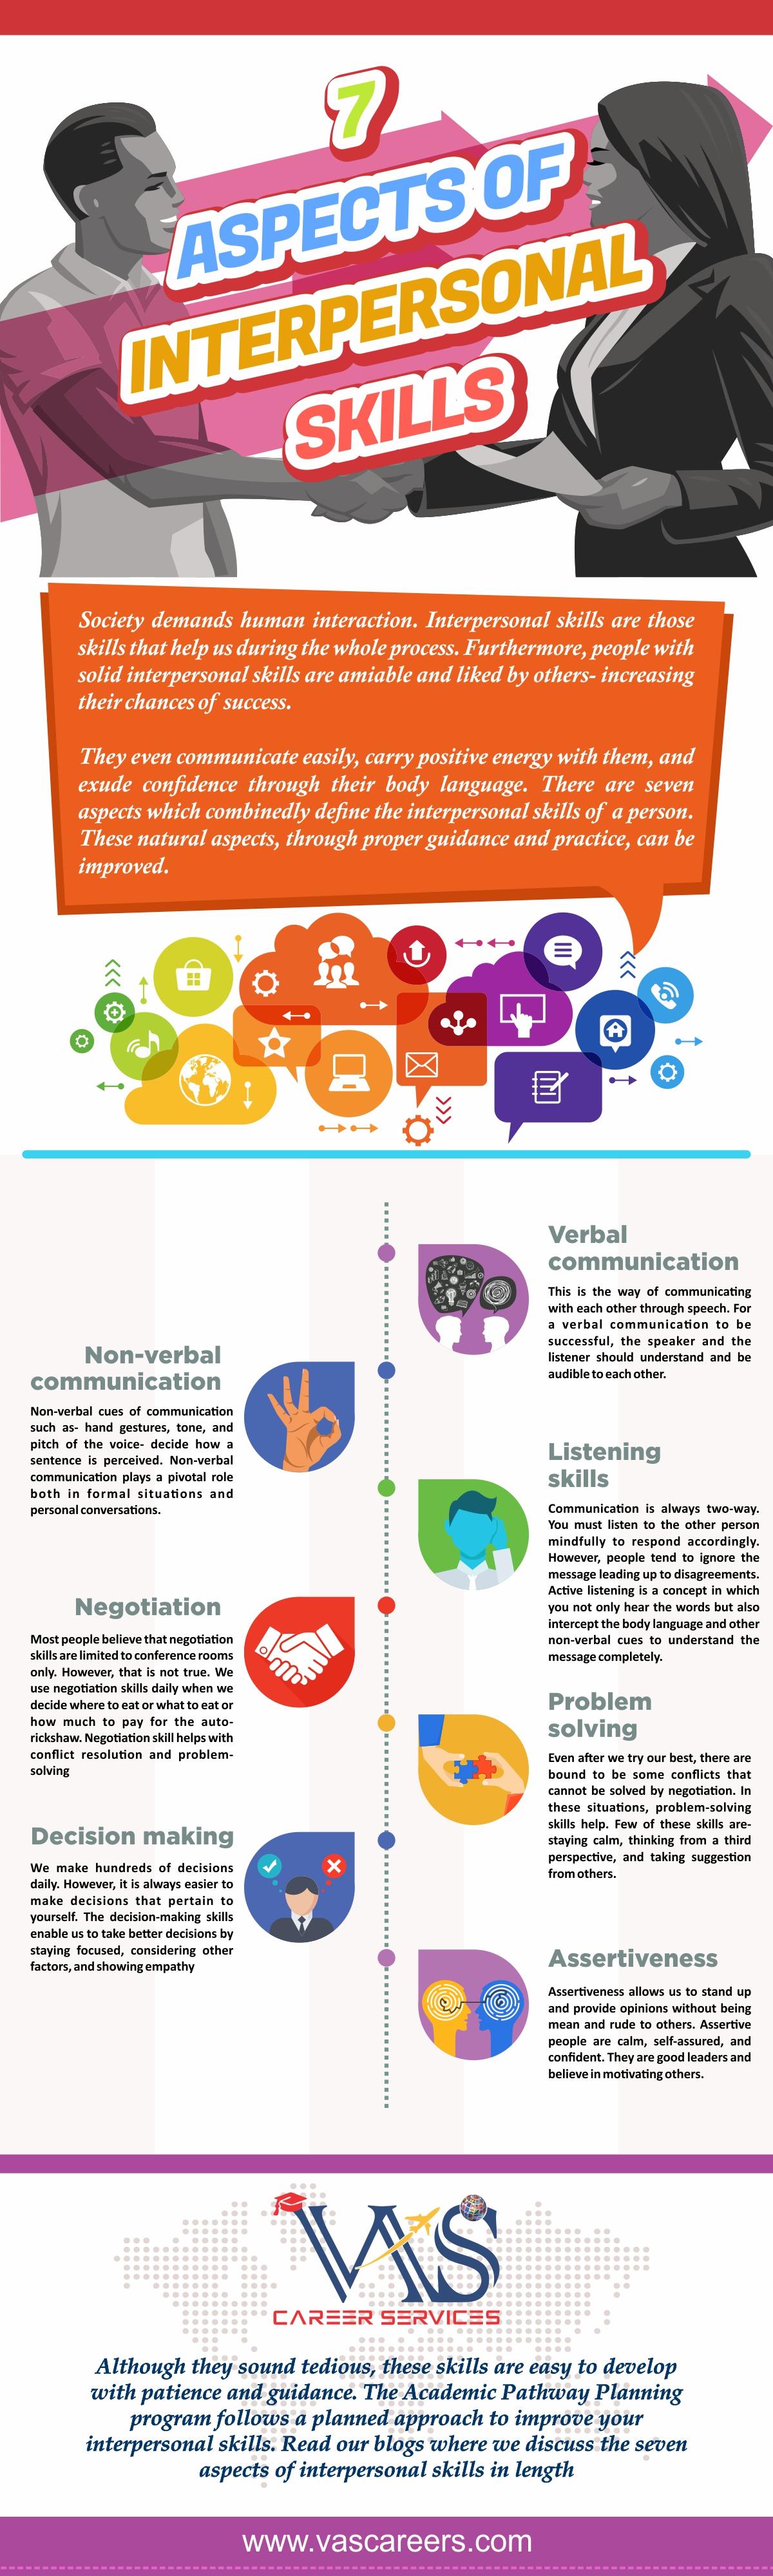 Aspects of Interpersonal Skills